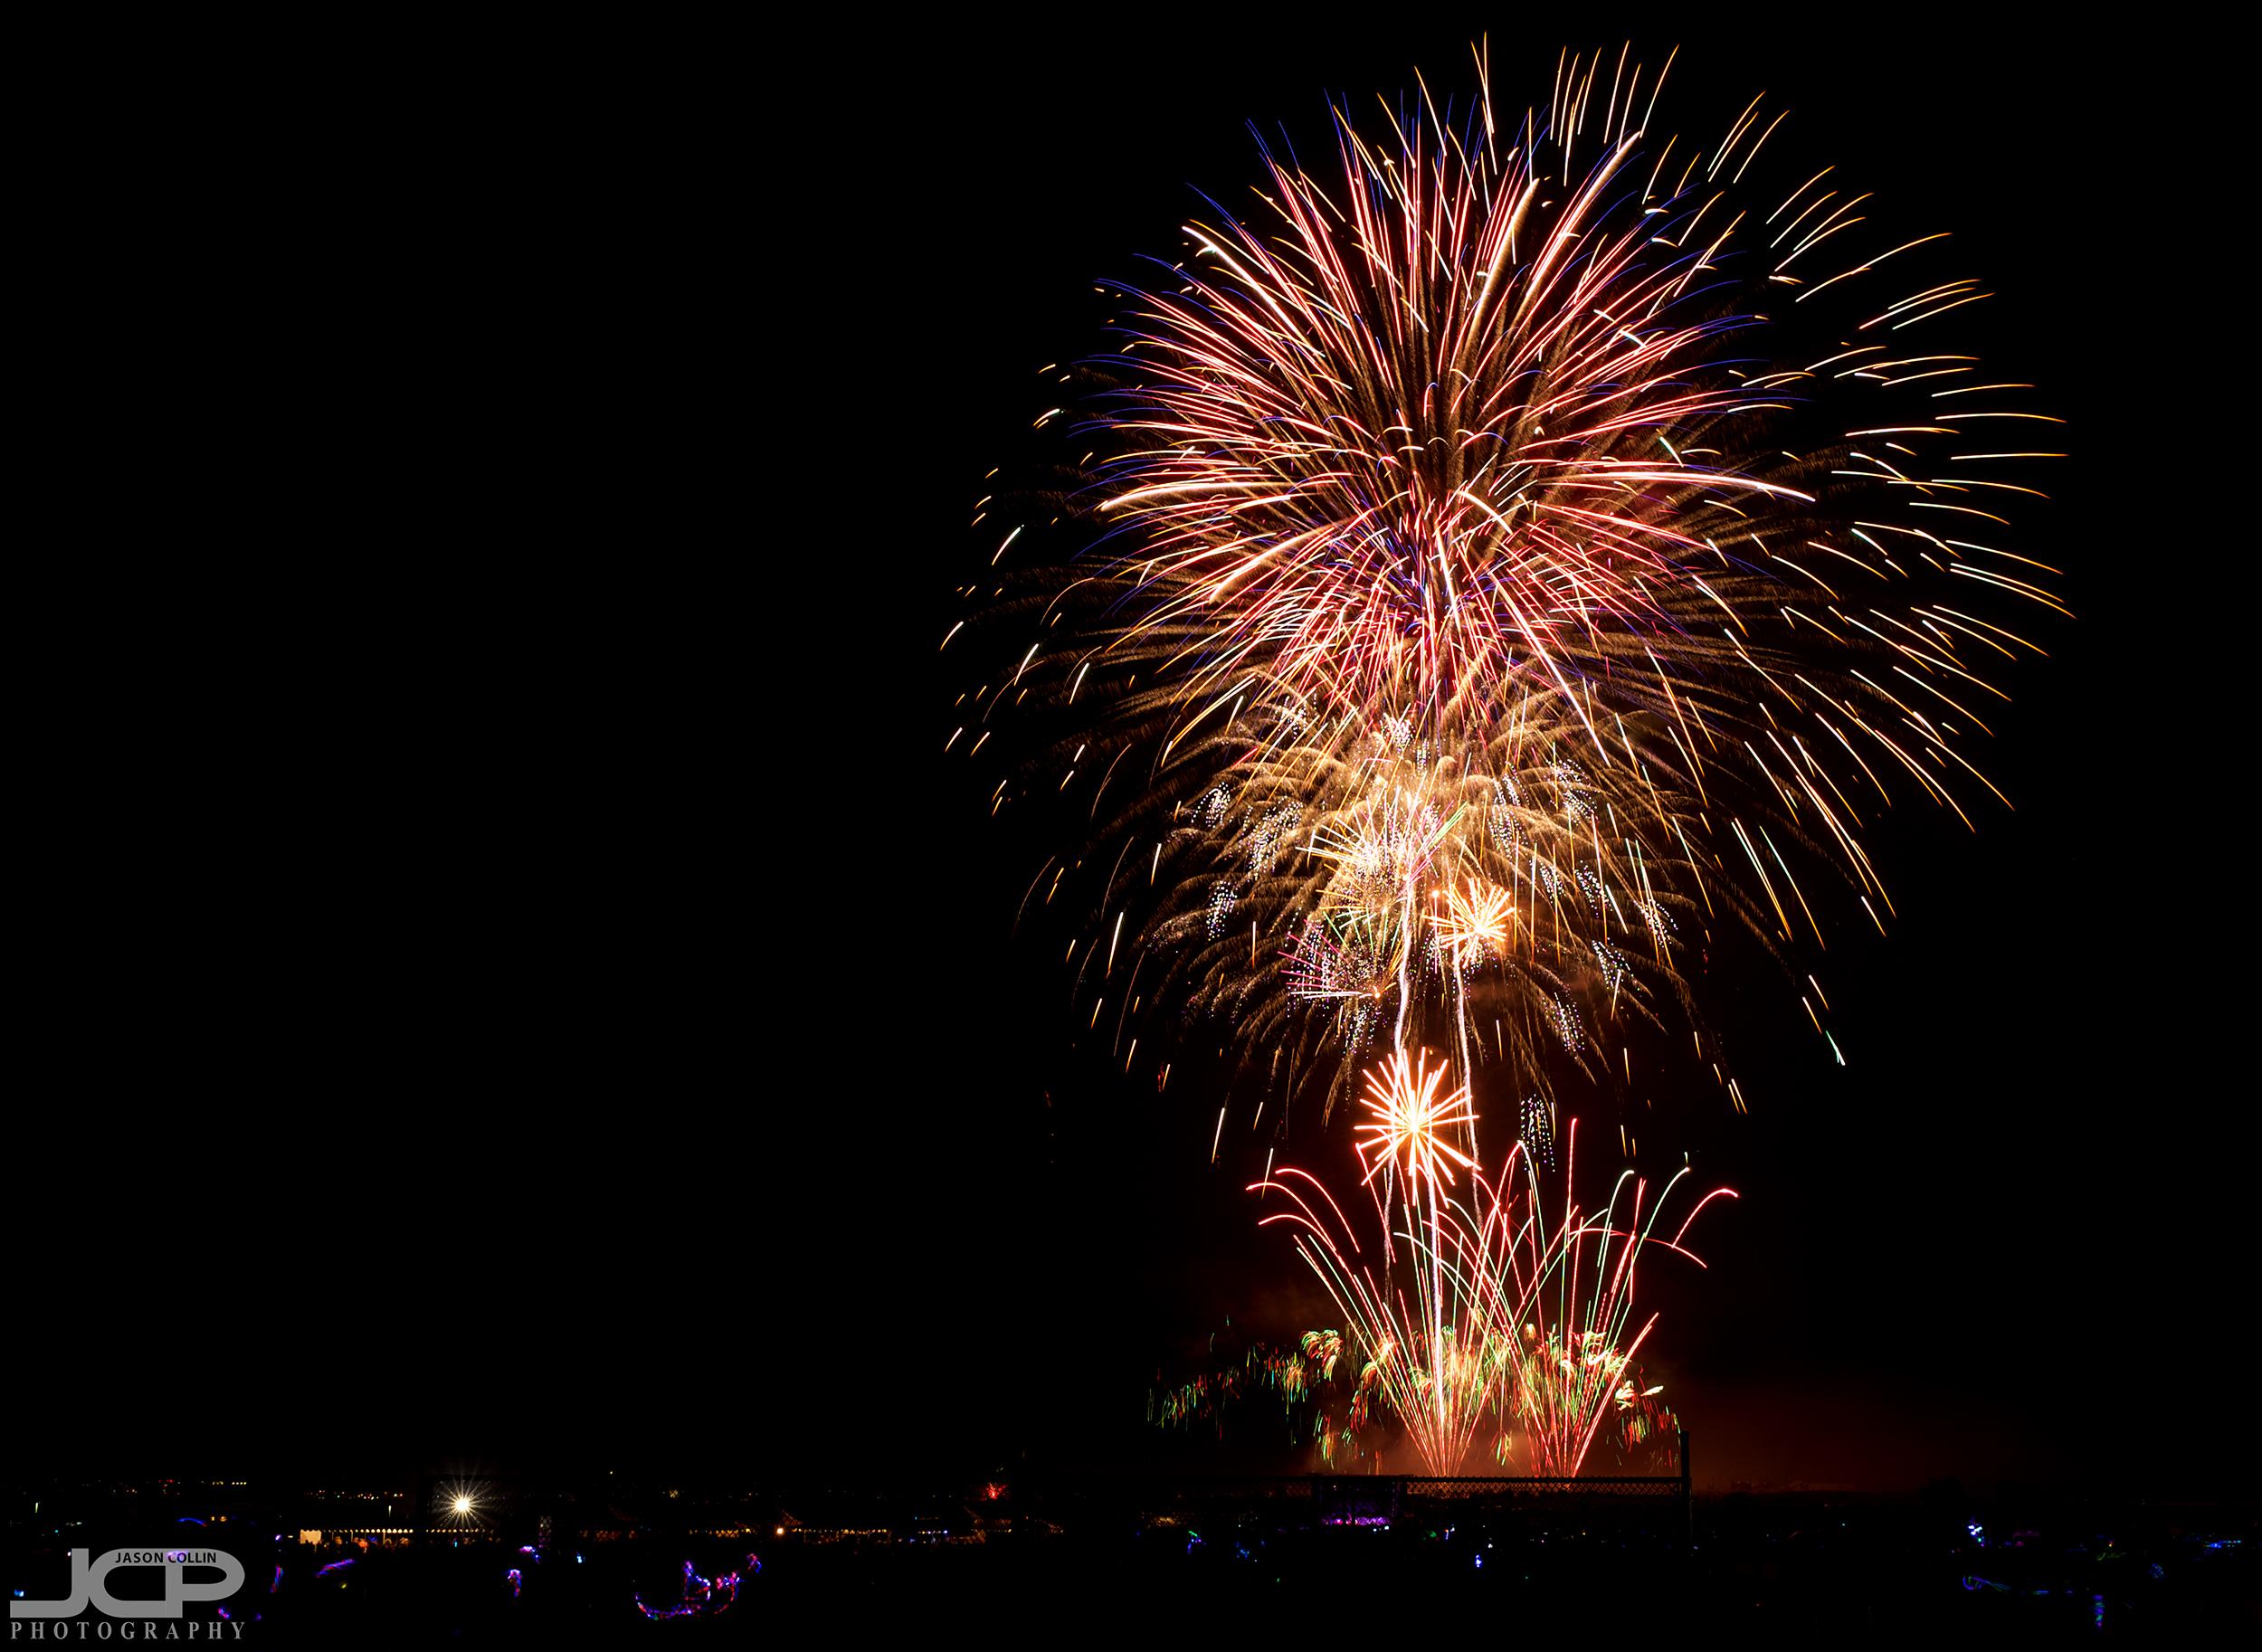 fireworks-7-04-2019-abq-131759.jpg